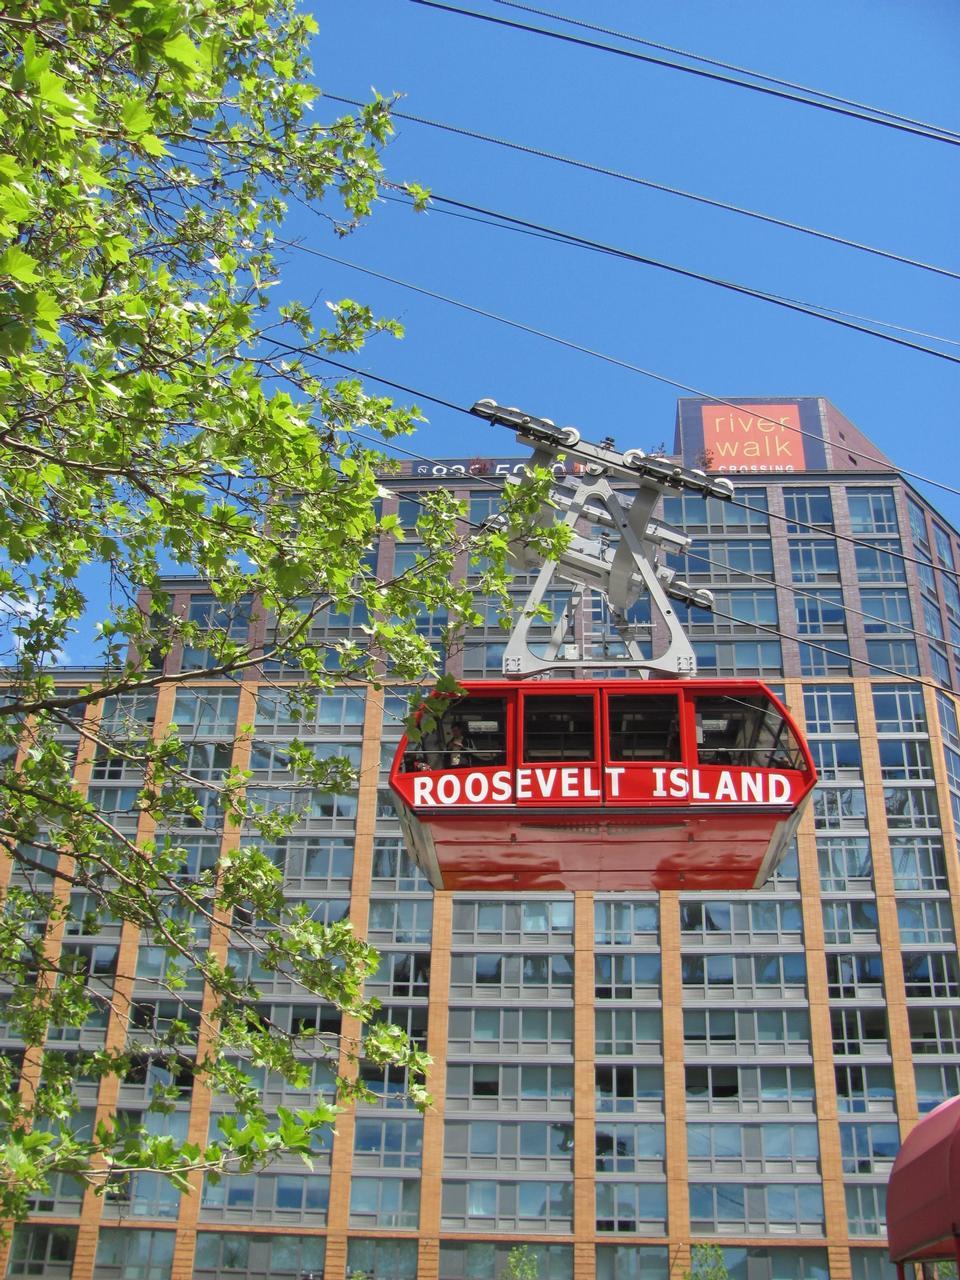 Free Roosevelt Island Tramway  in Manhattan, New York